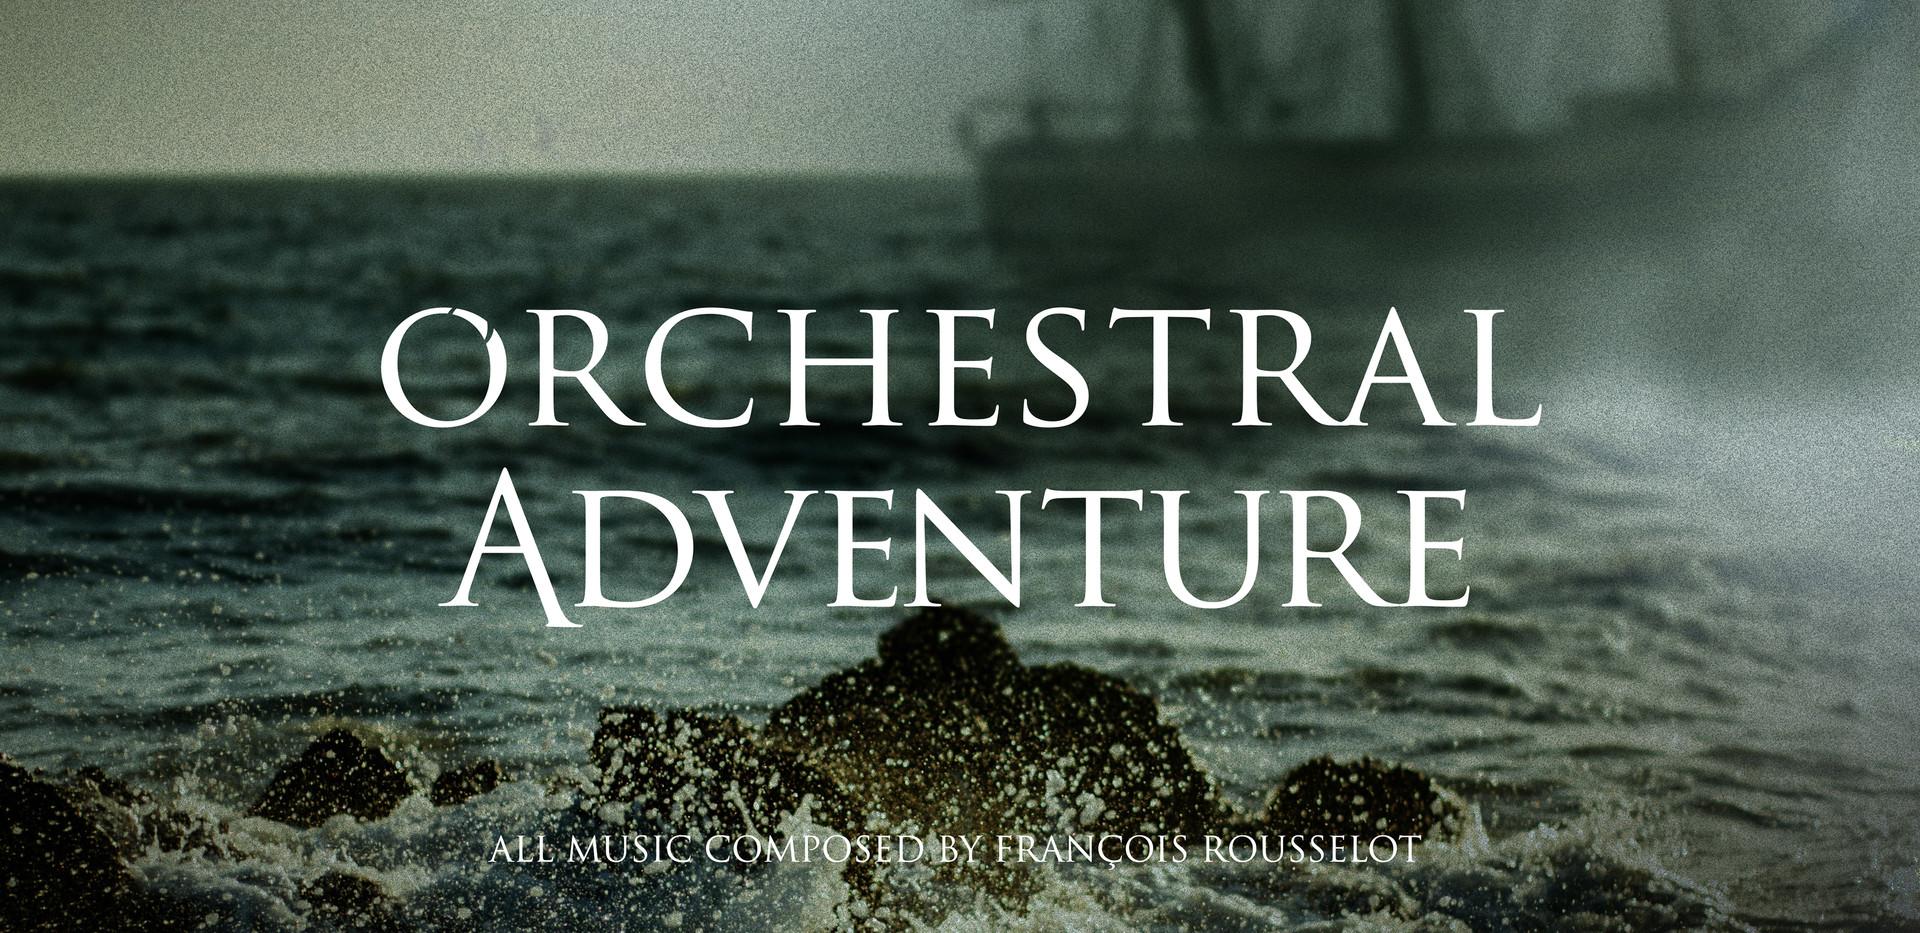 orchestraladventurebateau.jpg